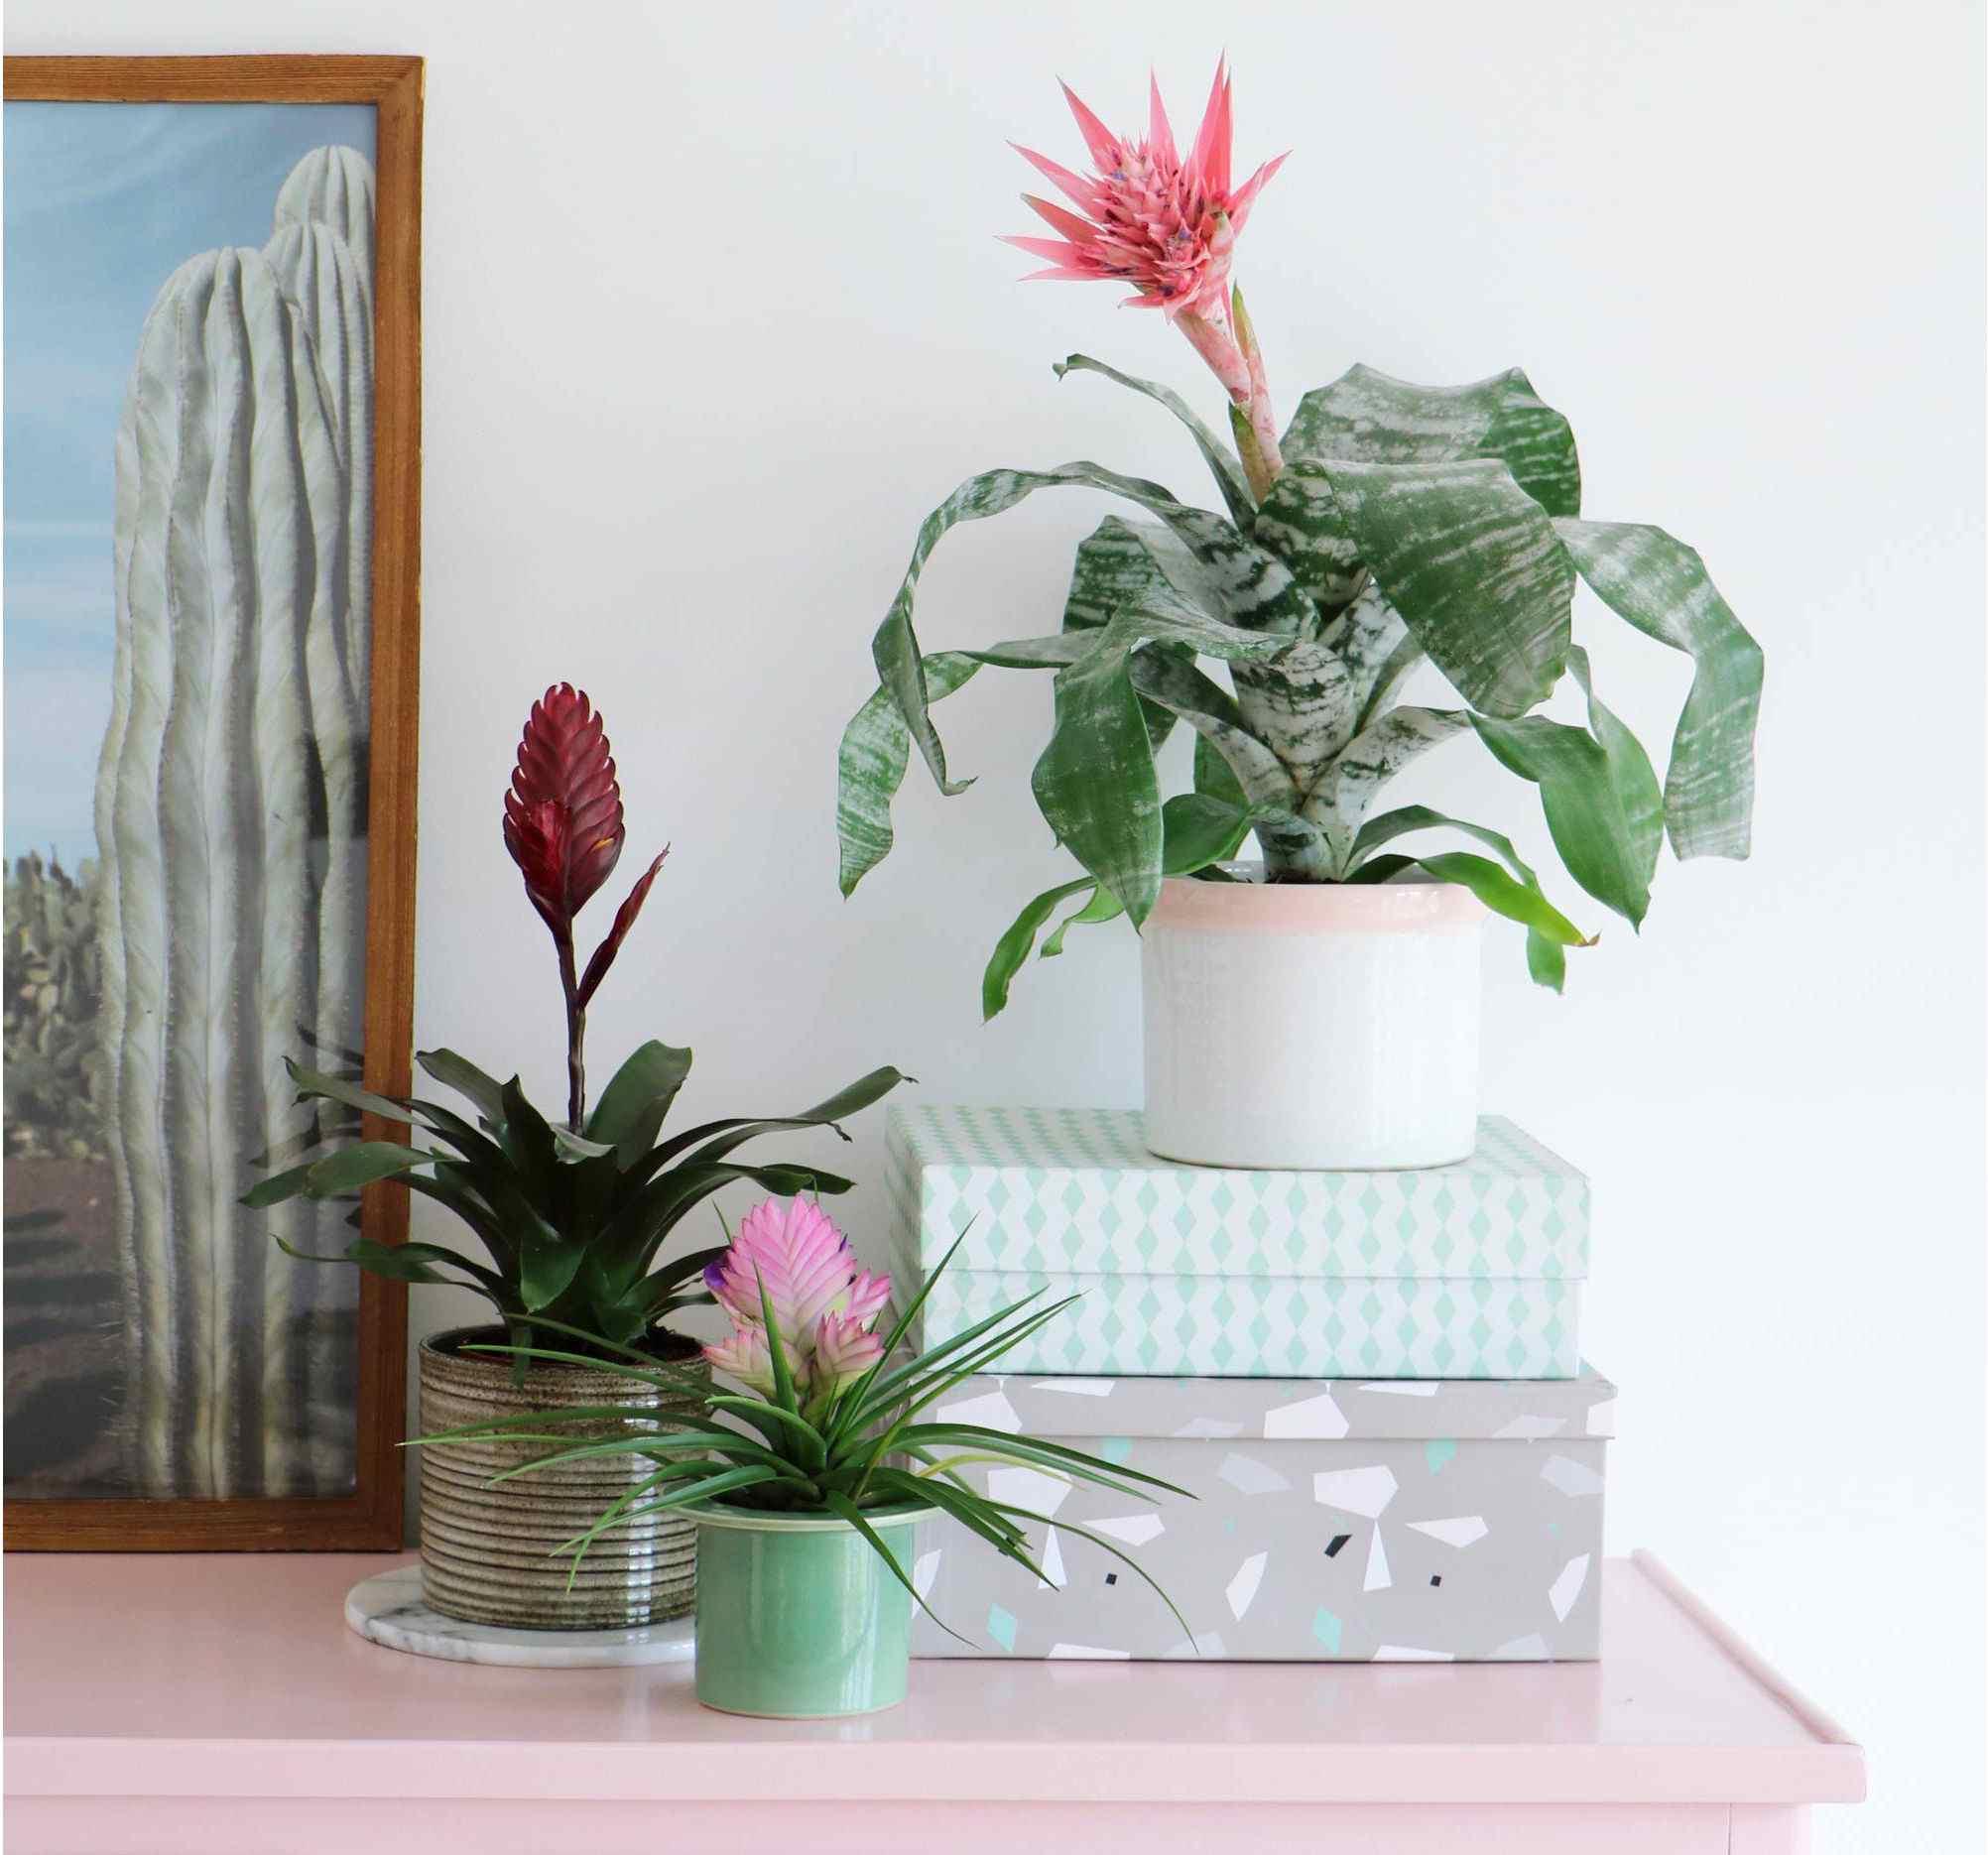 Tropical plant on dresser